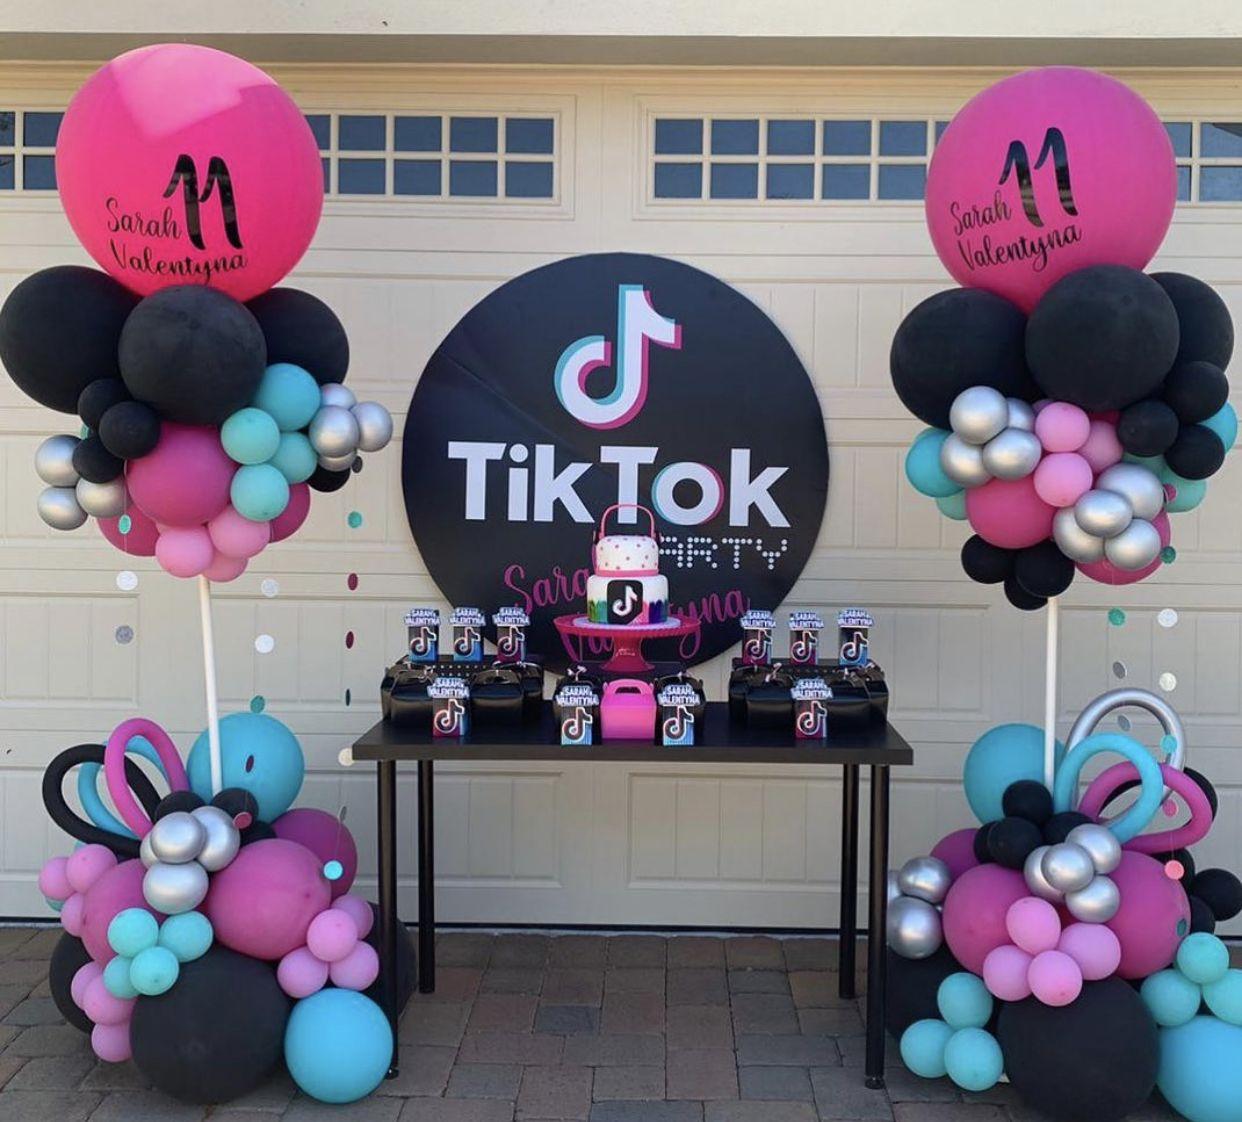 Pin By Anna On Tiktok Birthday Party Birthday Surprise Party Birthday Party Balloon Dance Party Birthday